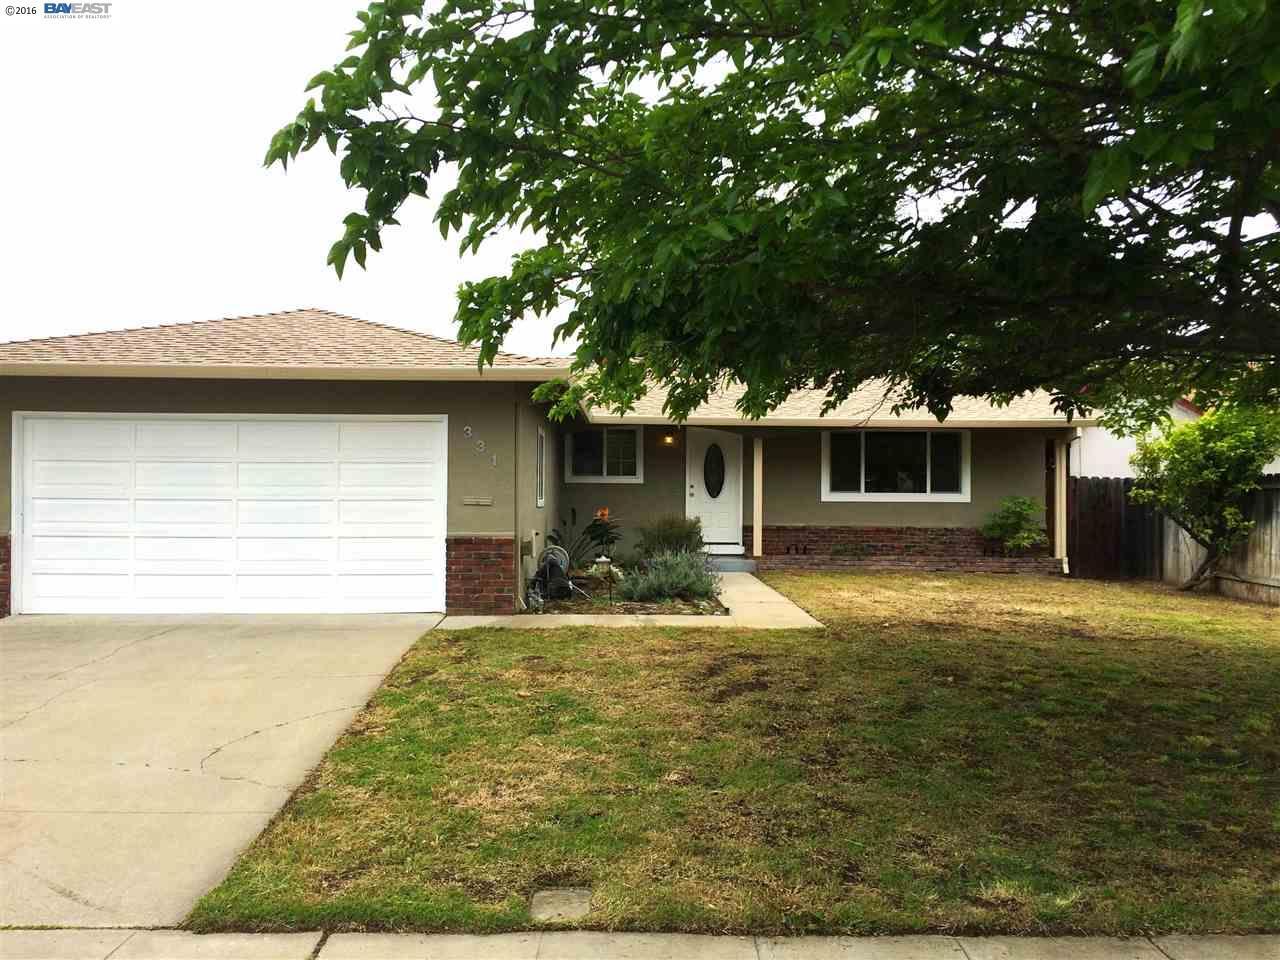 331 Edythe St, Livermore, CA